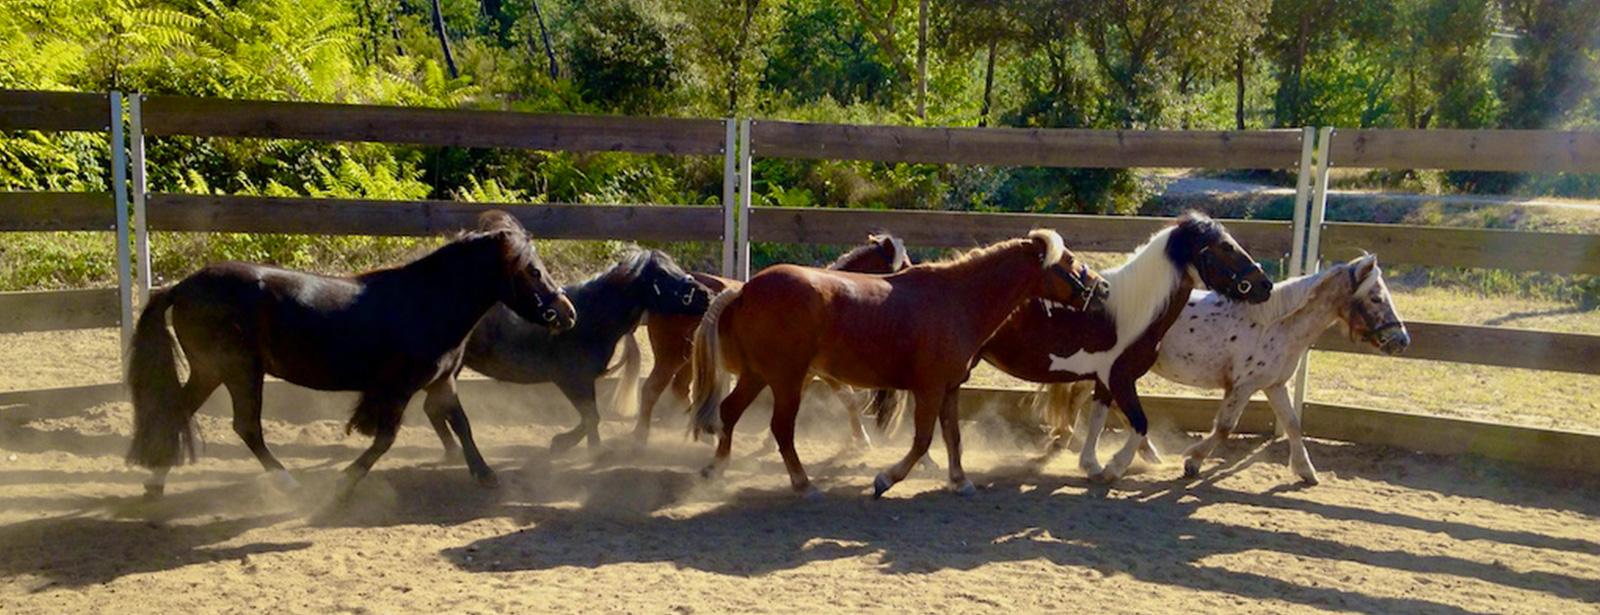 haras-merindol-chevaux2